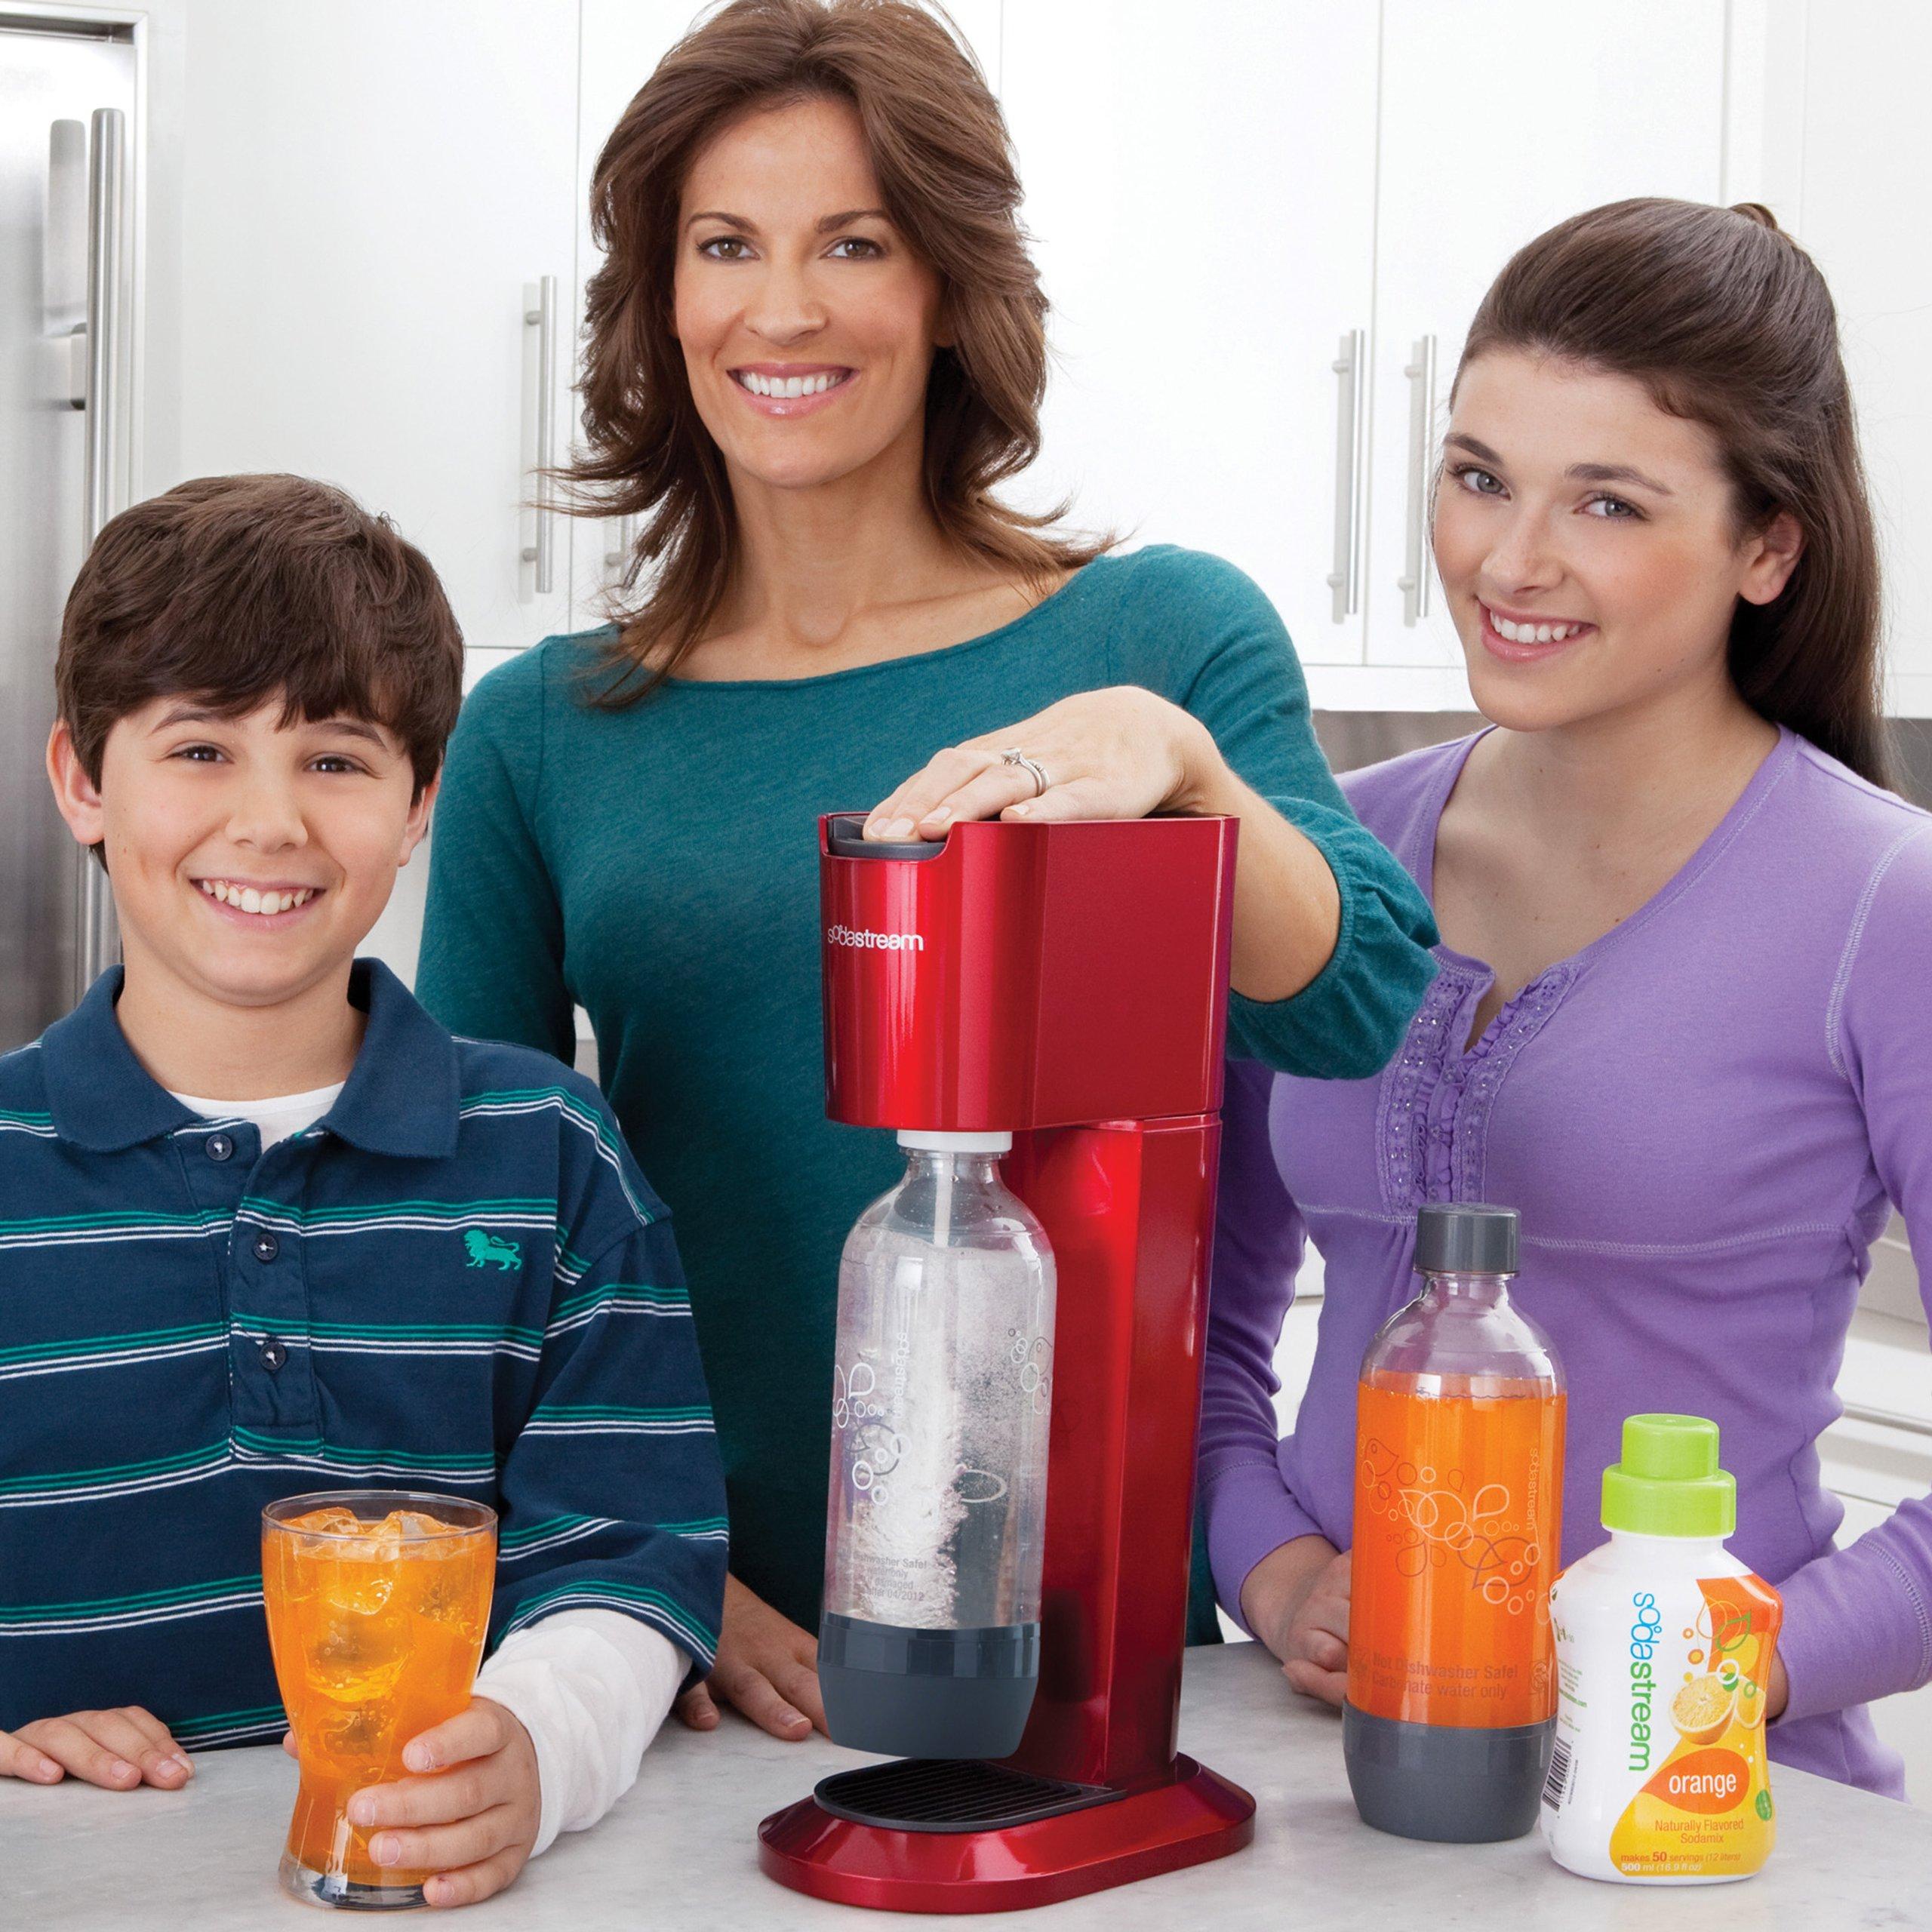 SodaStream Genesis Home Soda Maker Starter Kit, Red by SodaStream (Image #3)